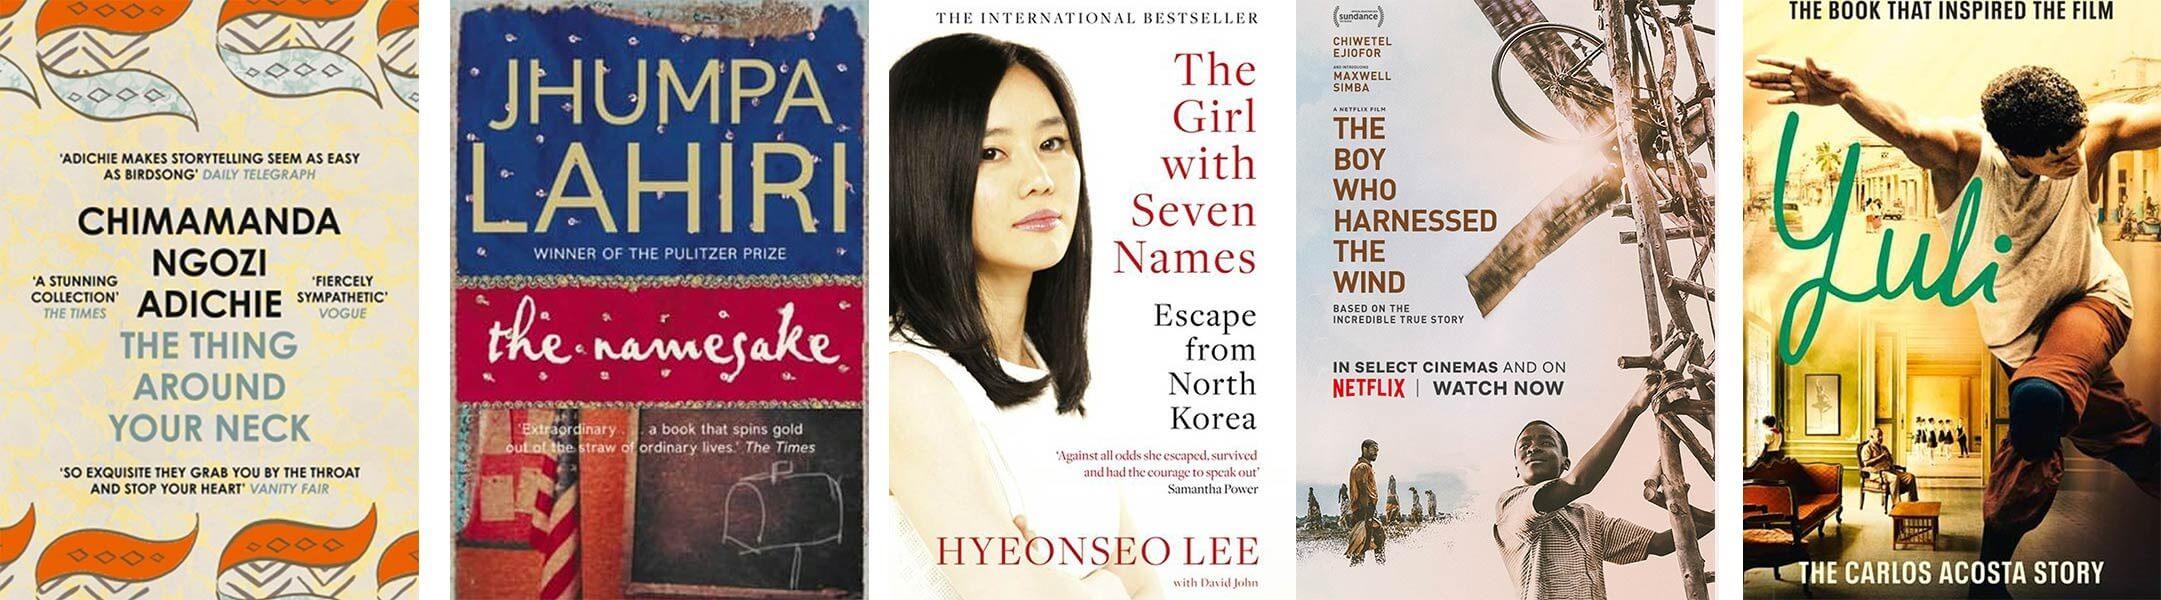 Chimamanda Ngozi, Jhumpa Lahiri, Hyeonseo Lee and more!